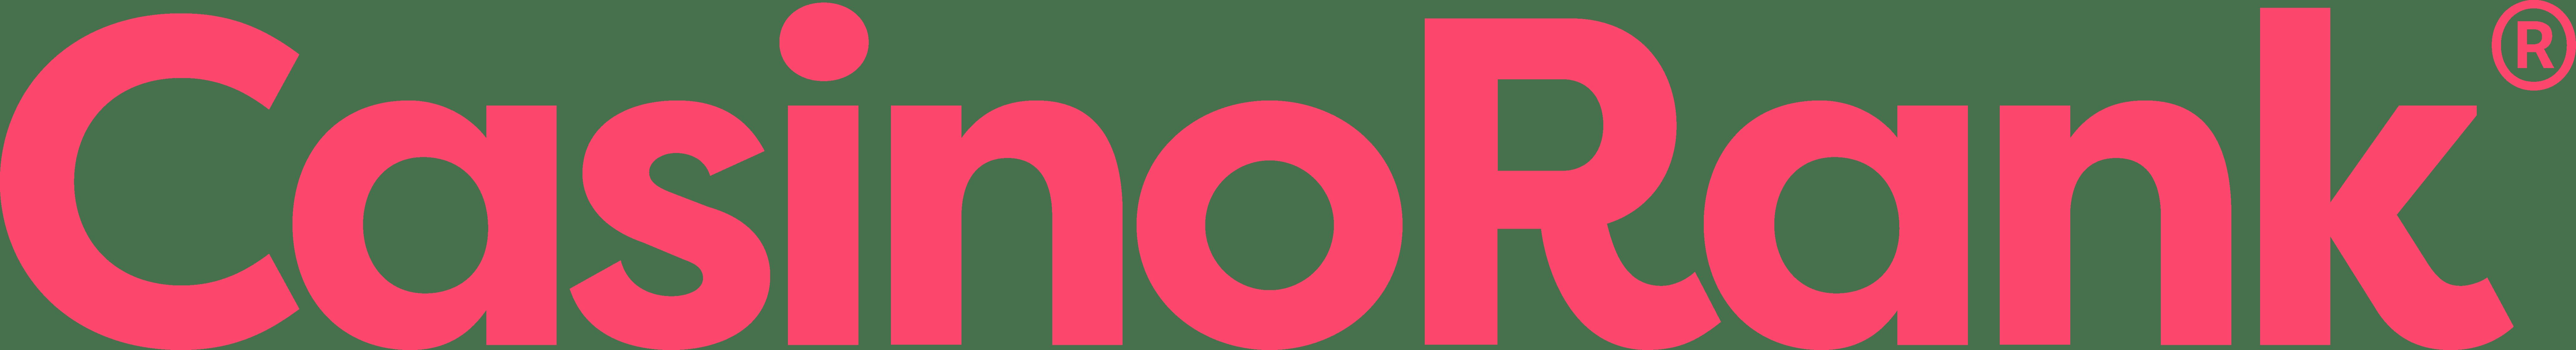 onlinecasinorank-kh.com